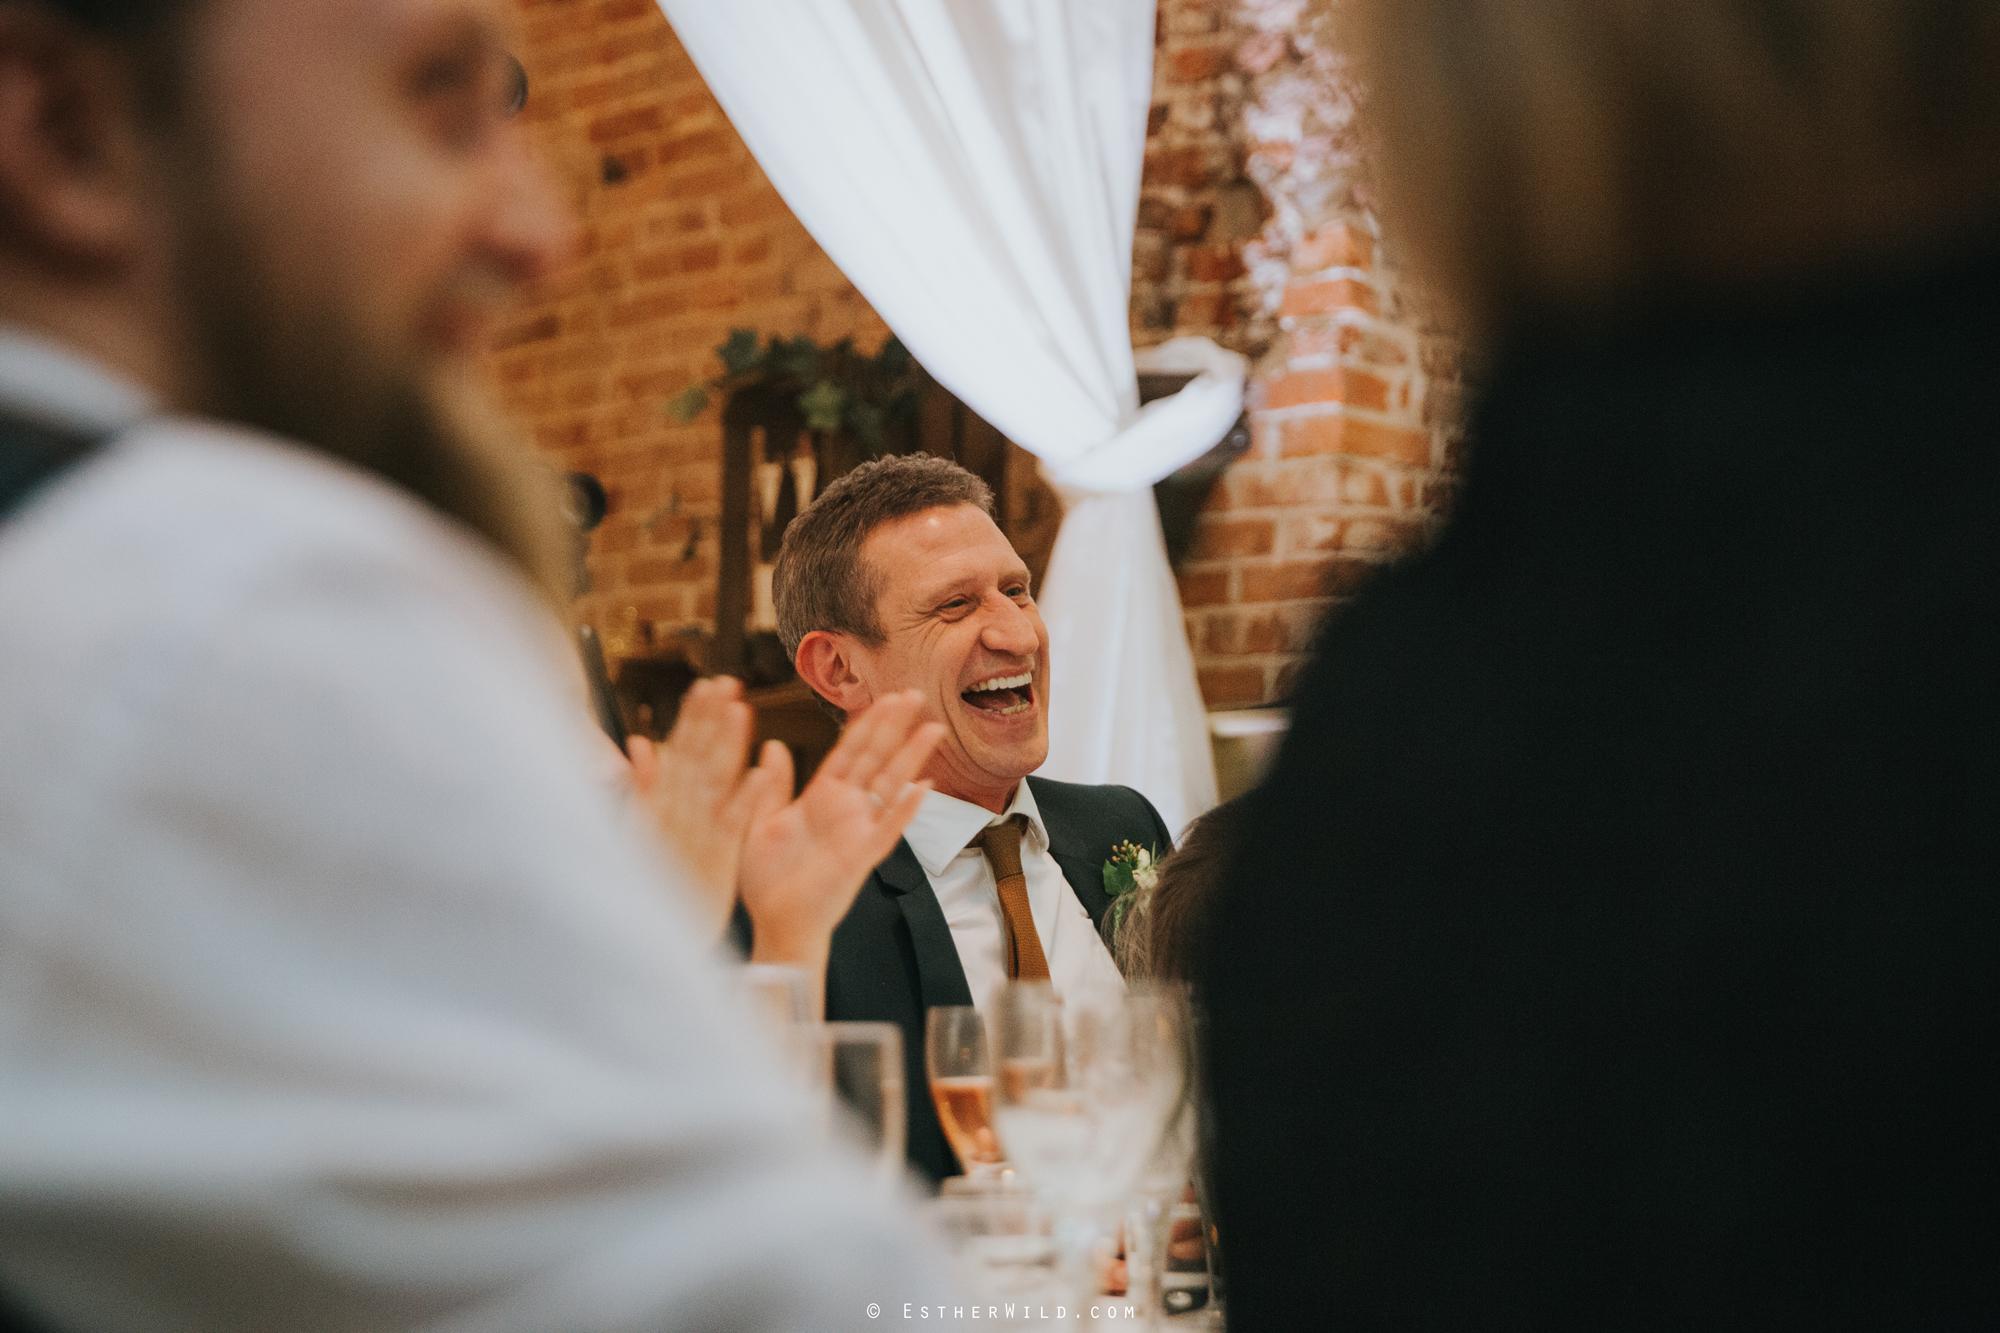 Elms_Barn_Weddings_Suffolk_Photographer_Copyright_Esther_Wild_IMG_2819.jpg